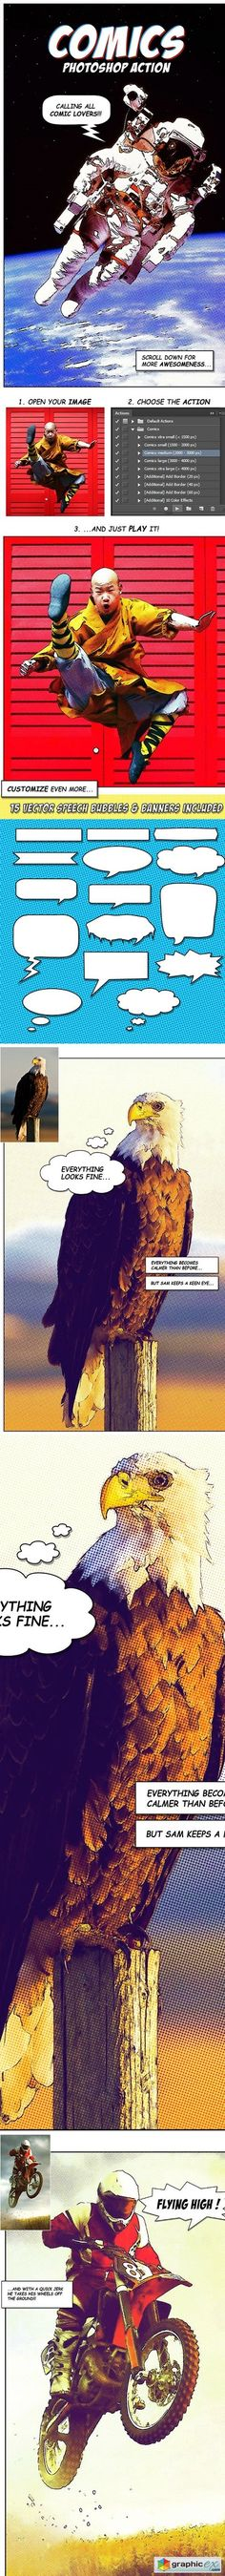 Comics Photoshop Action 17036318